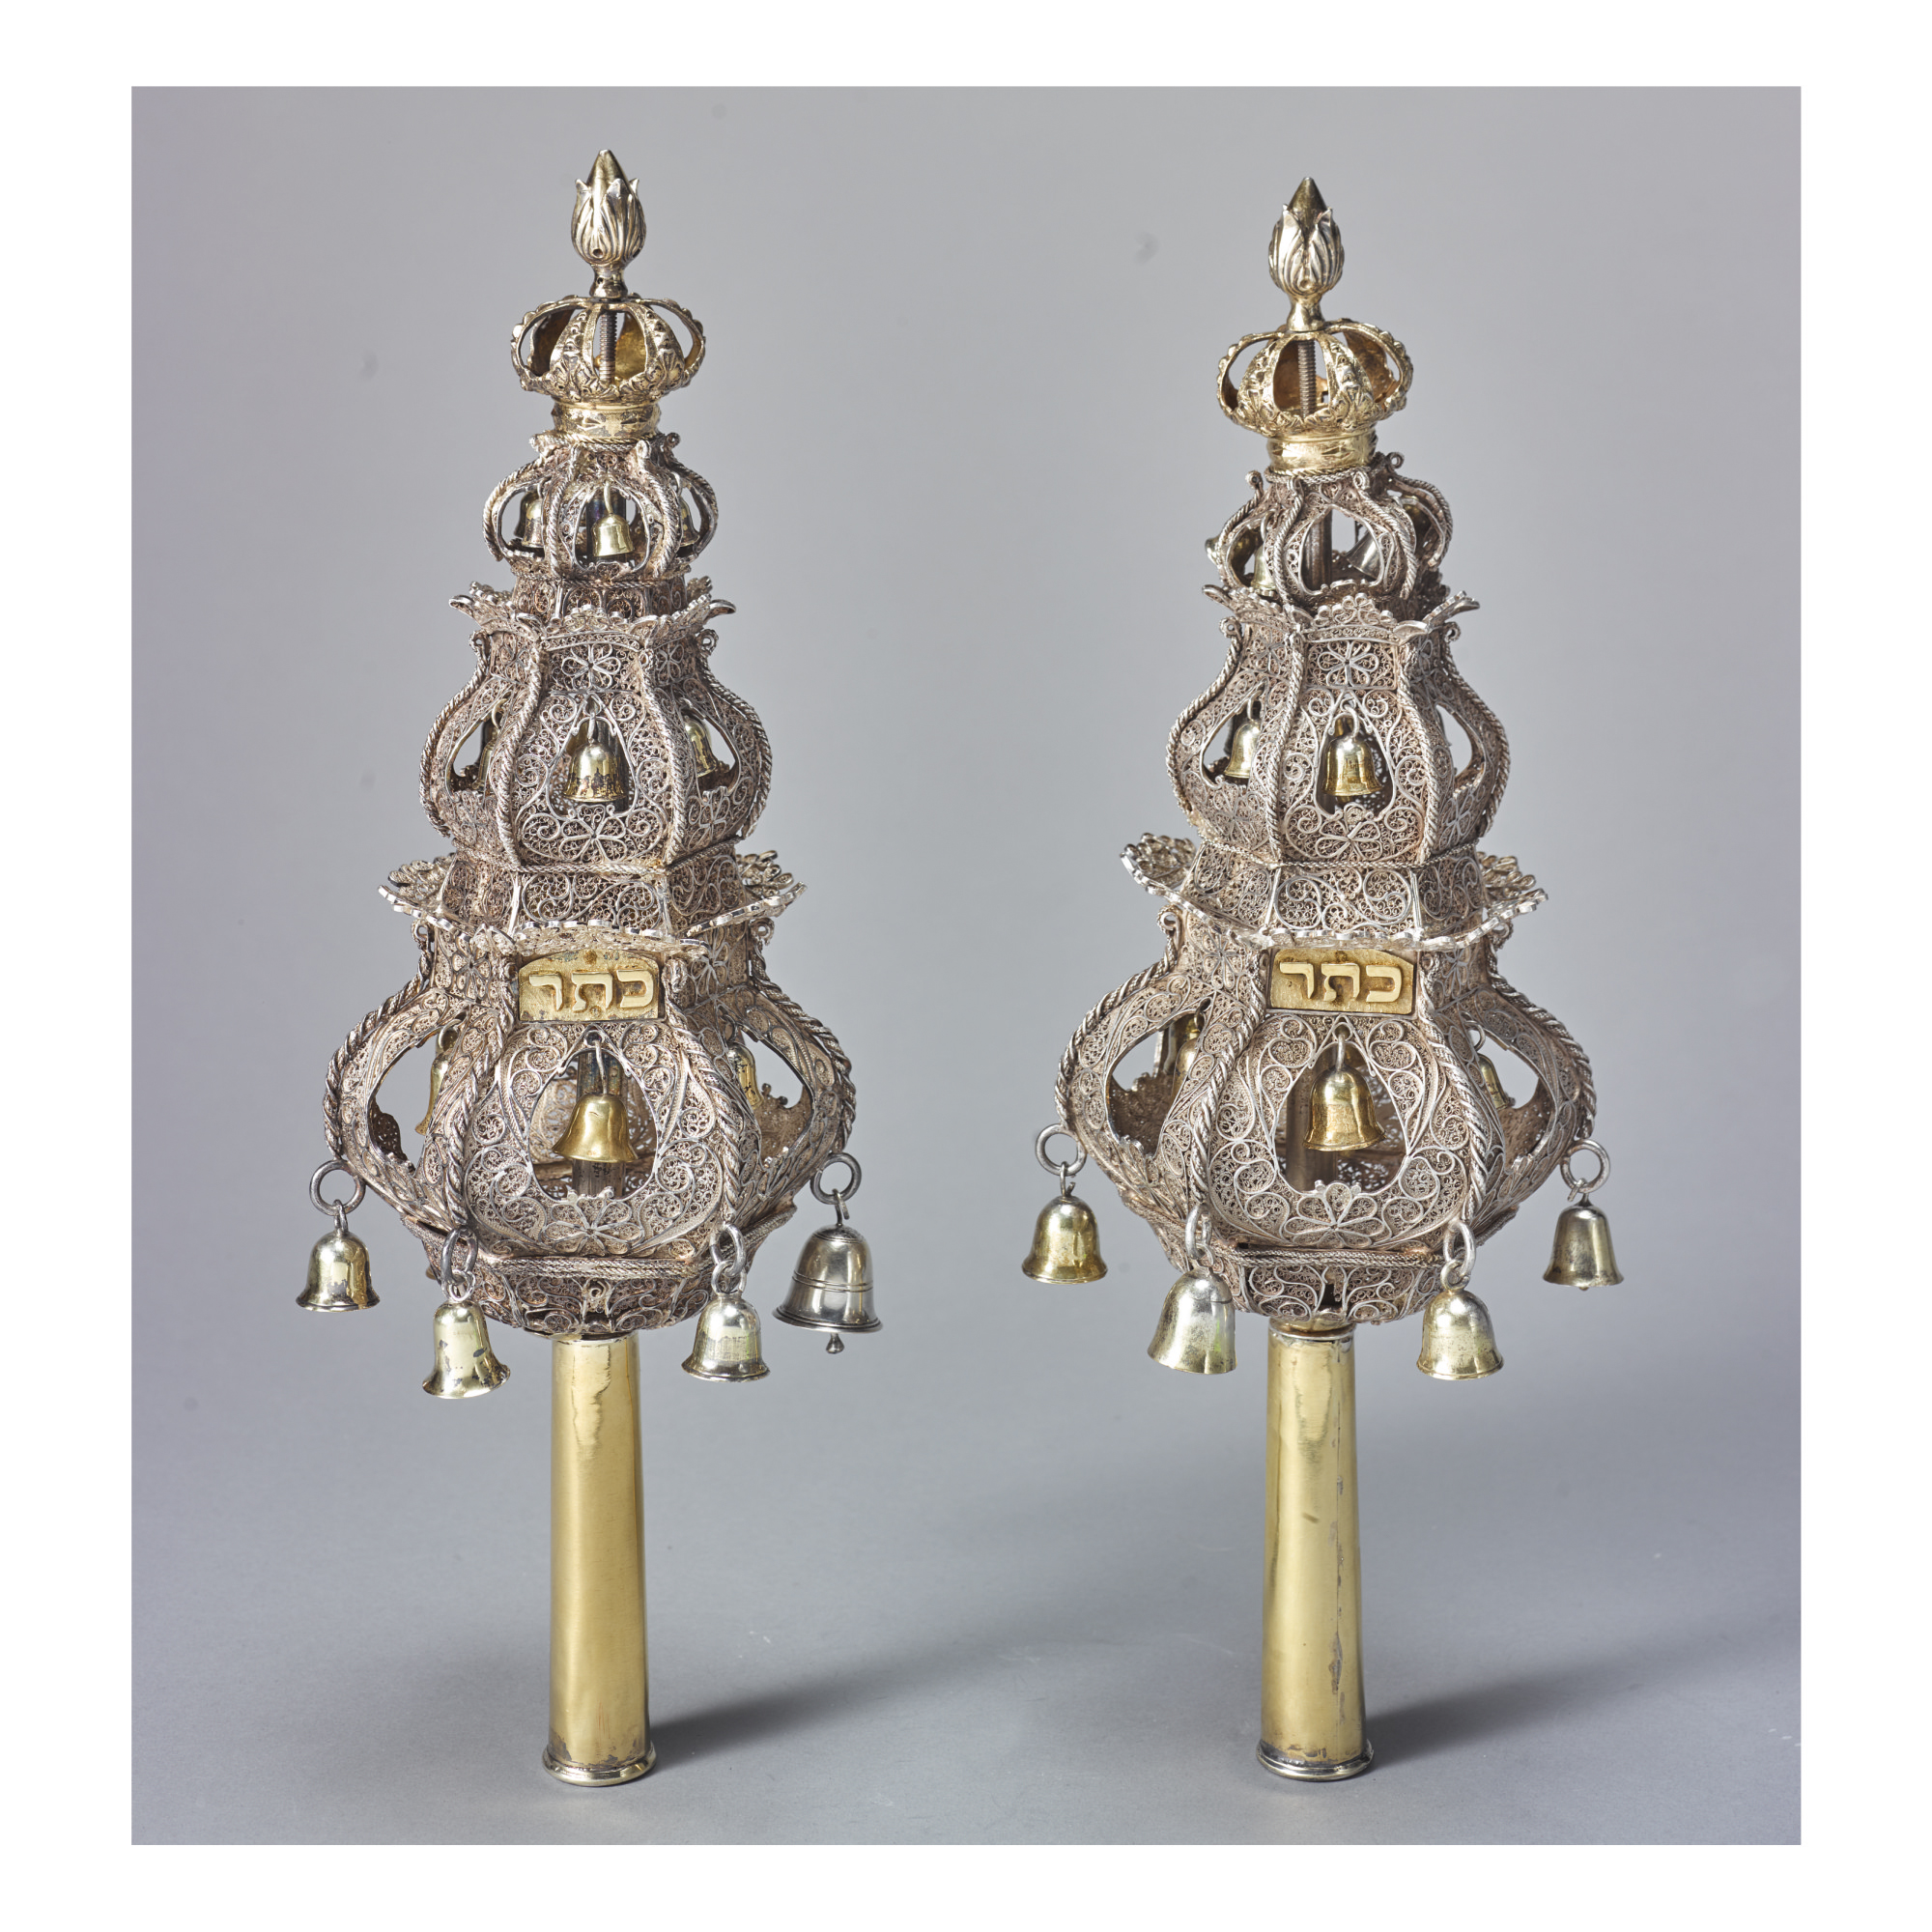 A PAIR OF DUTCH PARCEL-GILT SILVER FILIGREE TORAH FINIALS, EARLY 18TH CENTURY